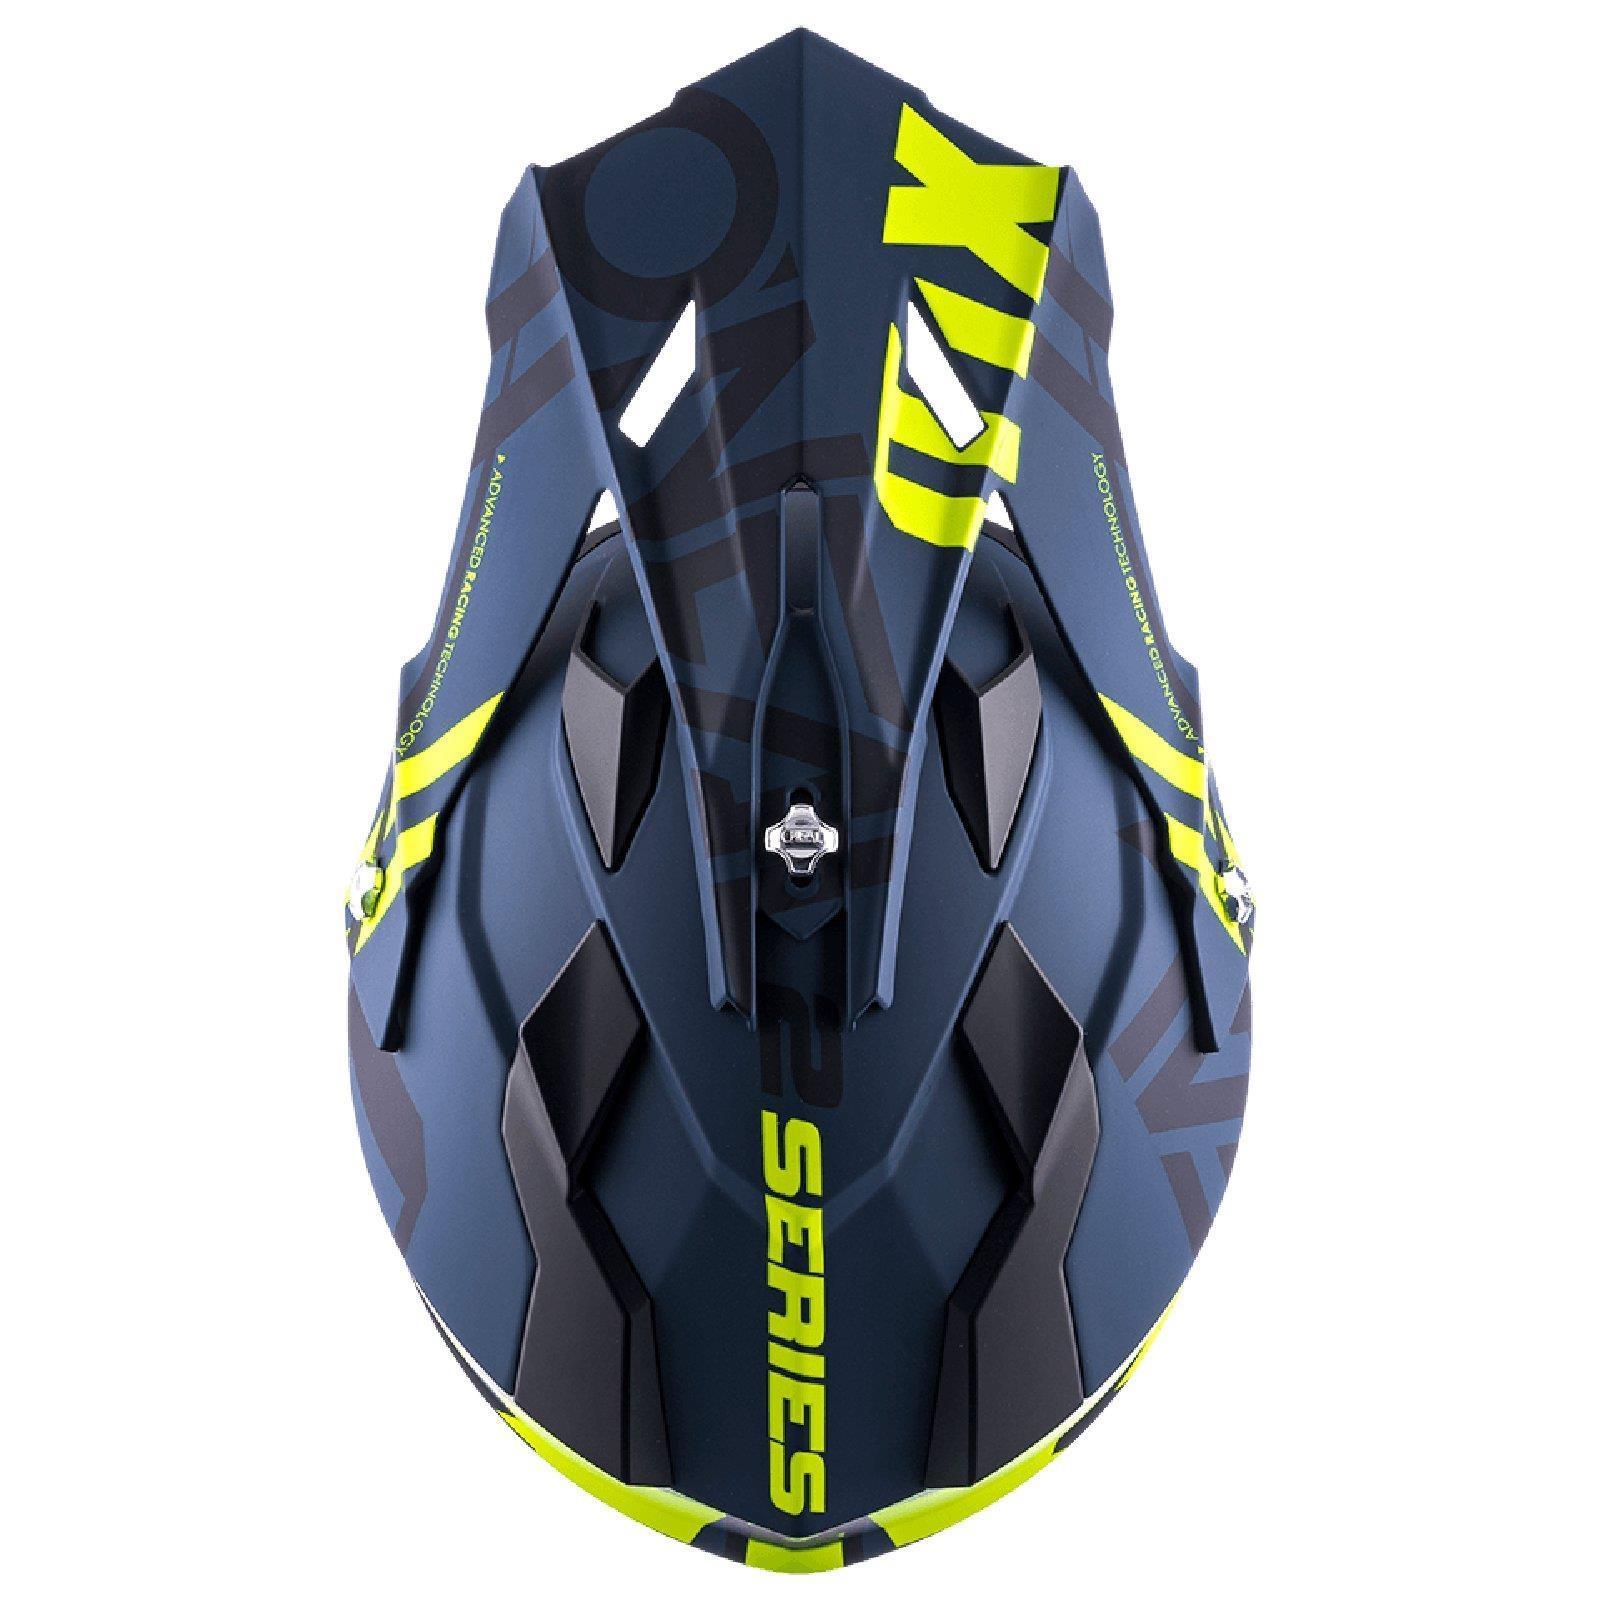 ONEAL-2-Series-RL-SPYDE-moto-cross-MX-Casco-Enduro-Trail-QUAD-OFFROAD-MOTO miniatura 21